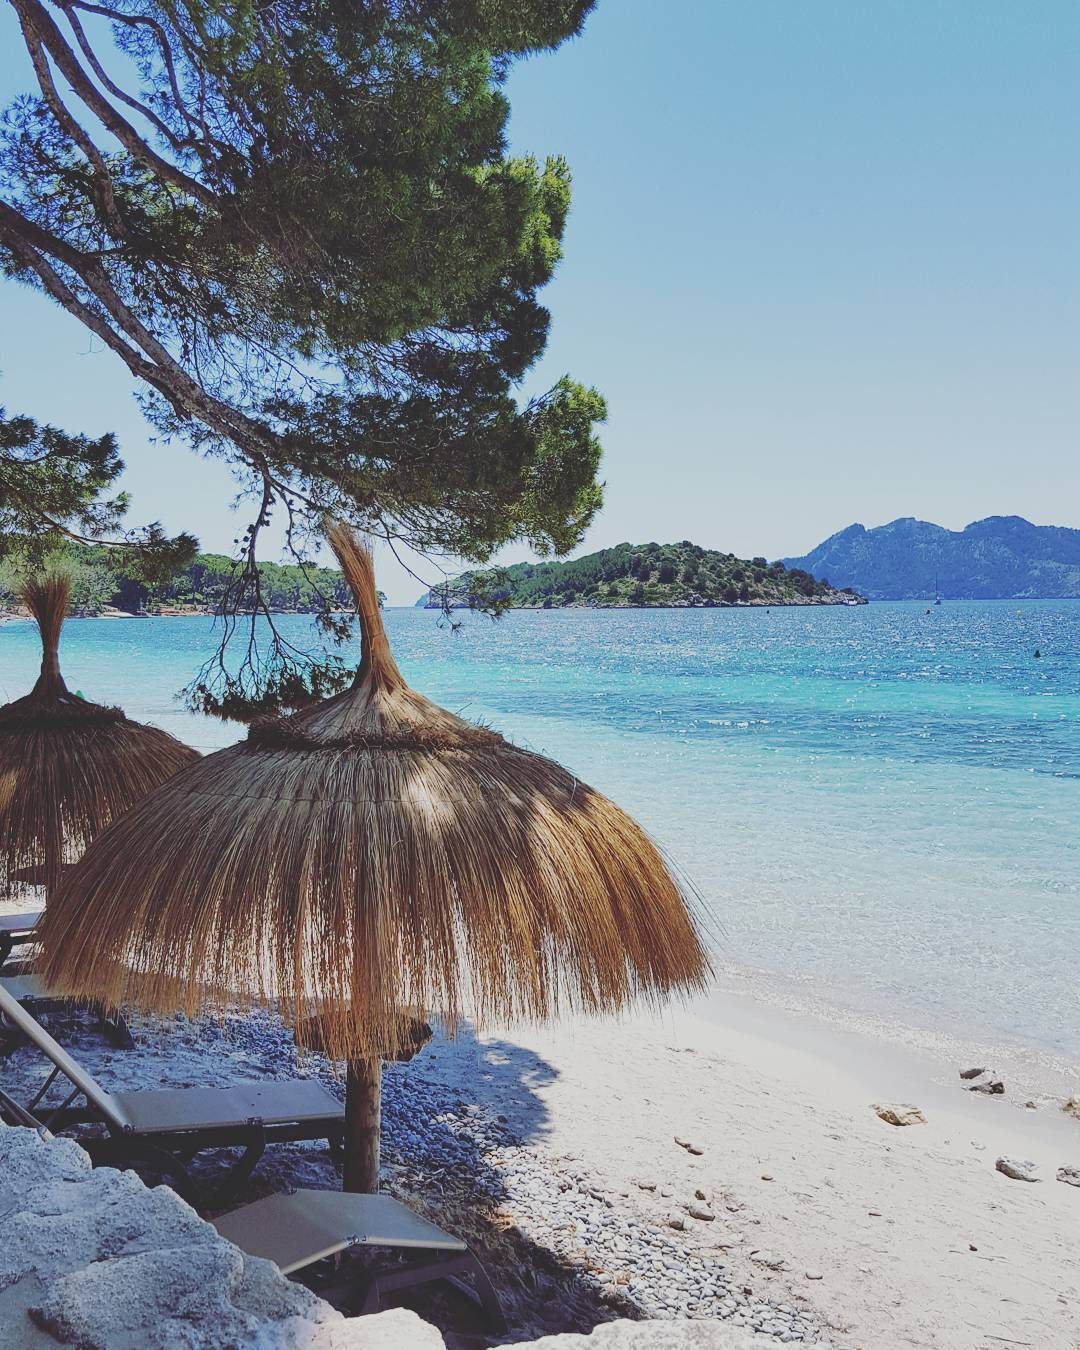 Geheimtipp Nr. 22: Caló des Màrmols - Mallorca Momente #vacationdestinations